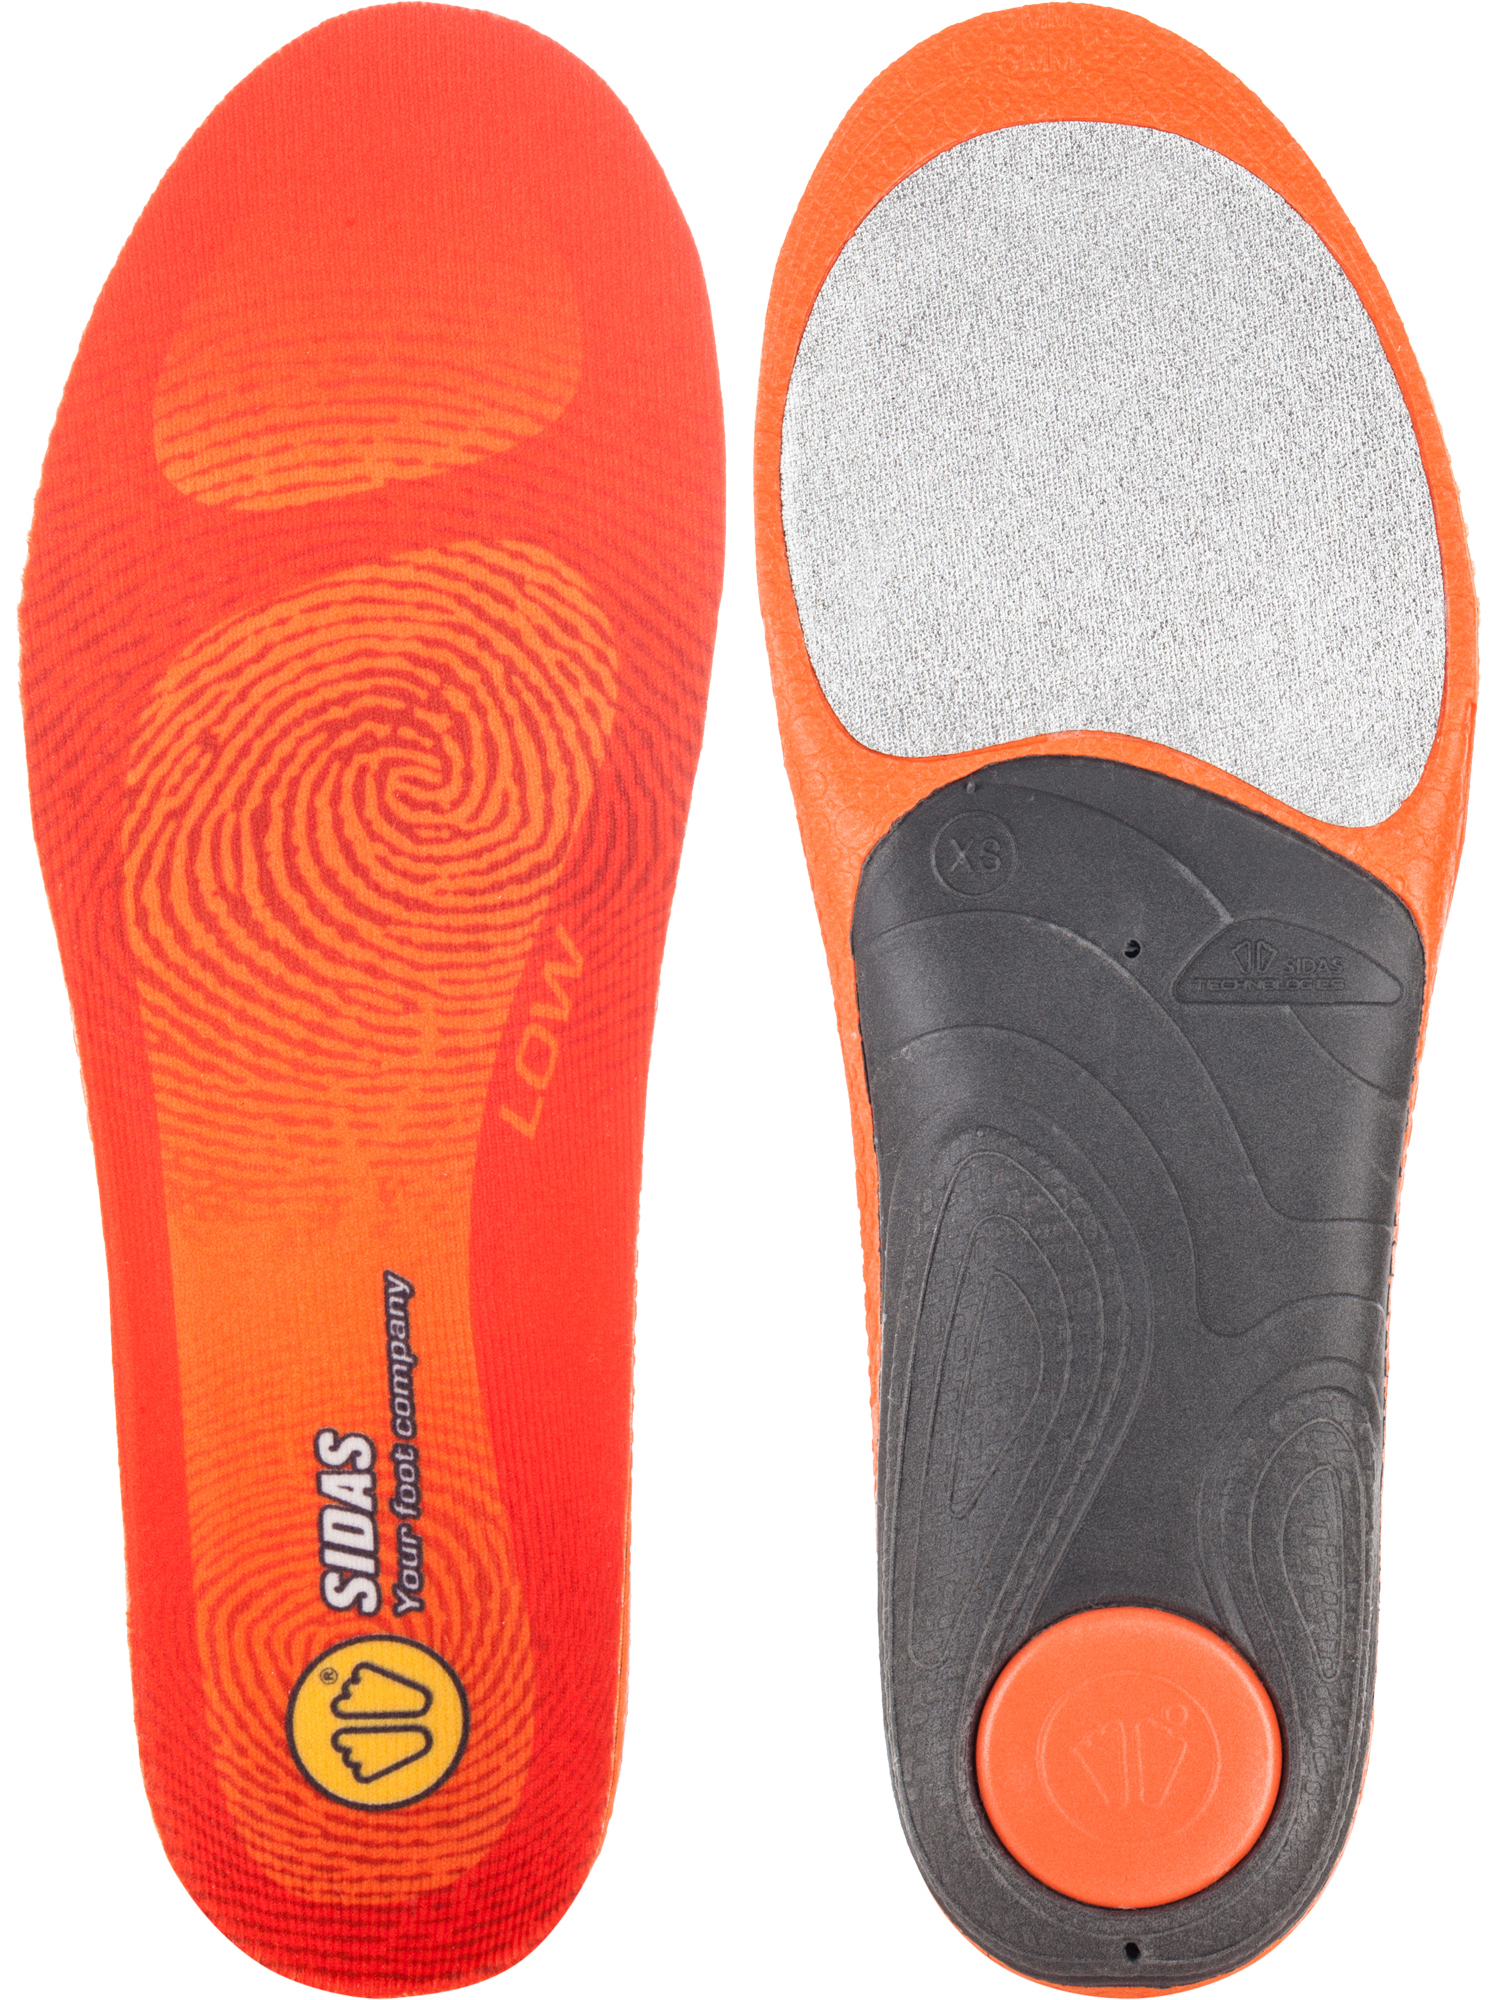 Sidas Стельки Sidas Feet стельки формируемые sidas custom ski prem xl